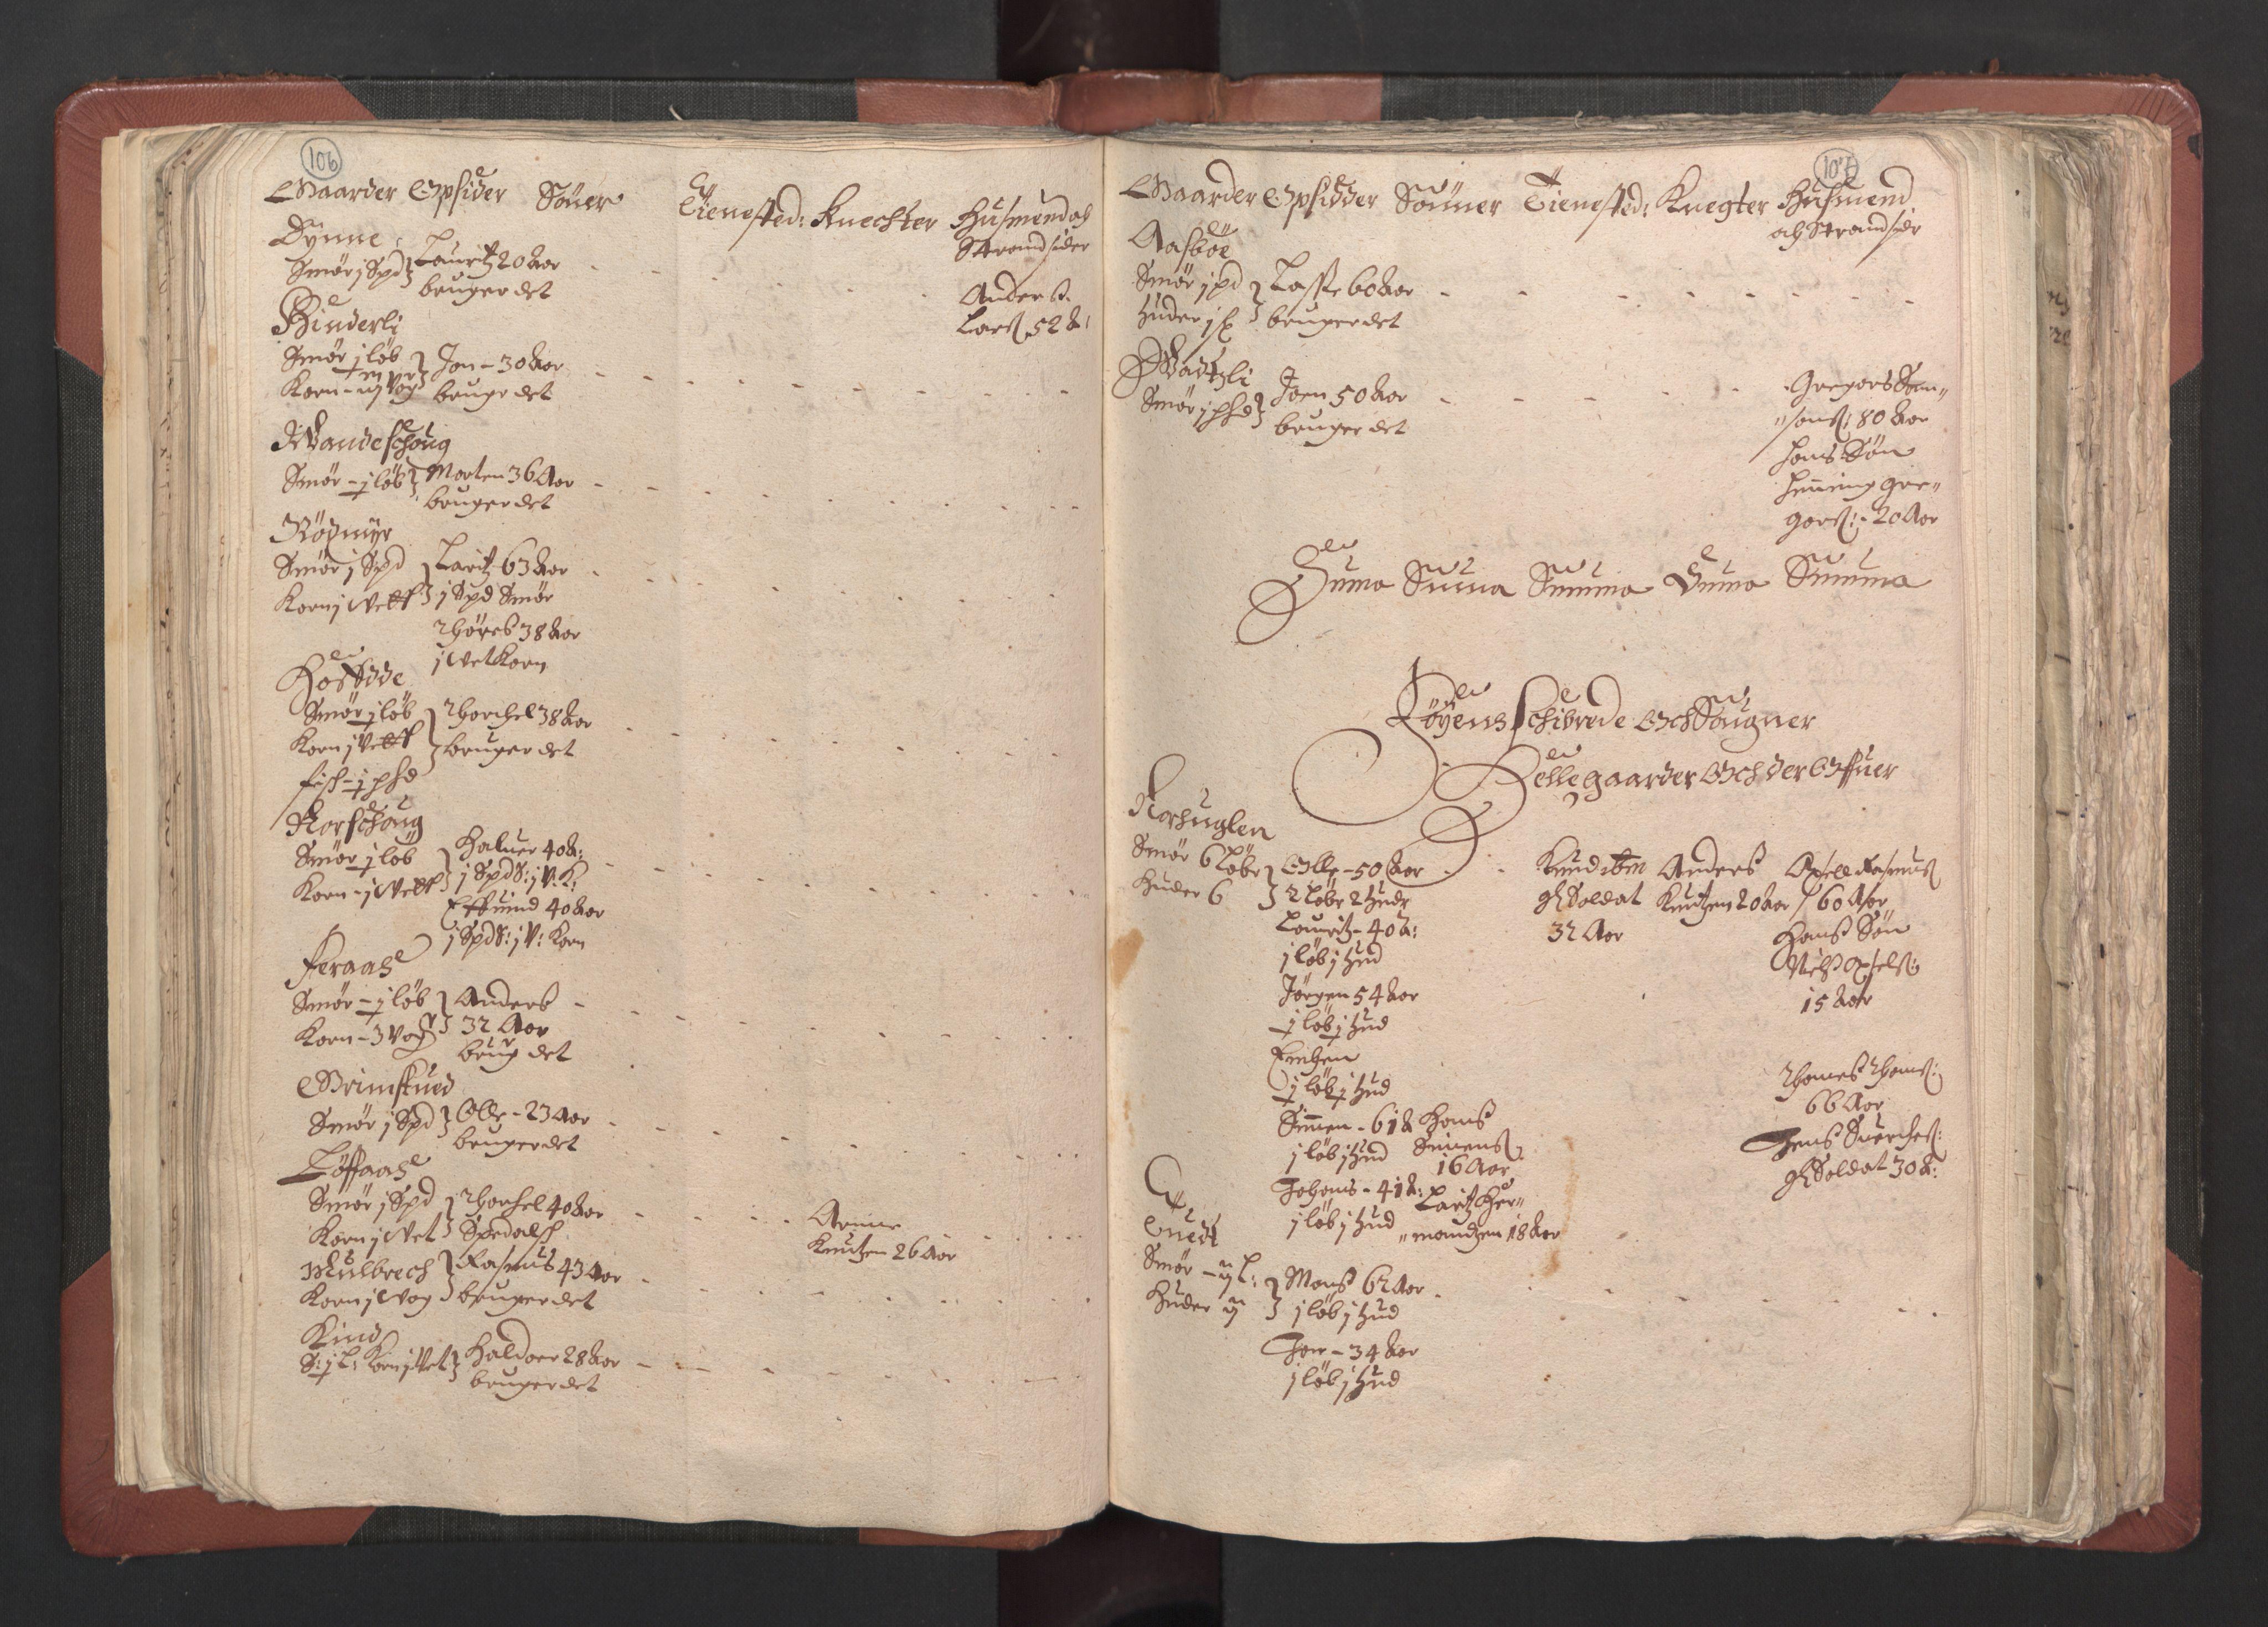 RA, Fogdenes og sorenskrivernes manntall 1664-1666, nr. 13: Nordhordland fogderi og Sunnhordland fogderi, 1665, s. 106-107